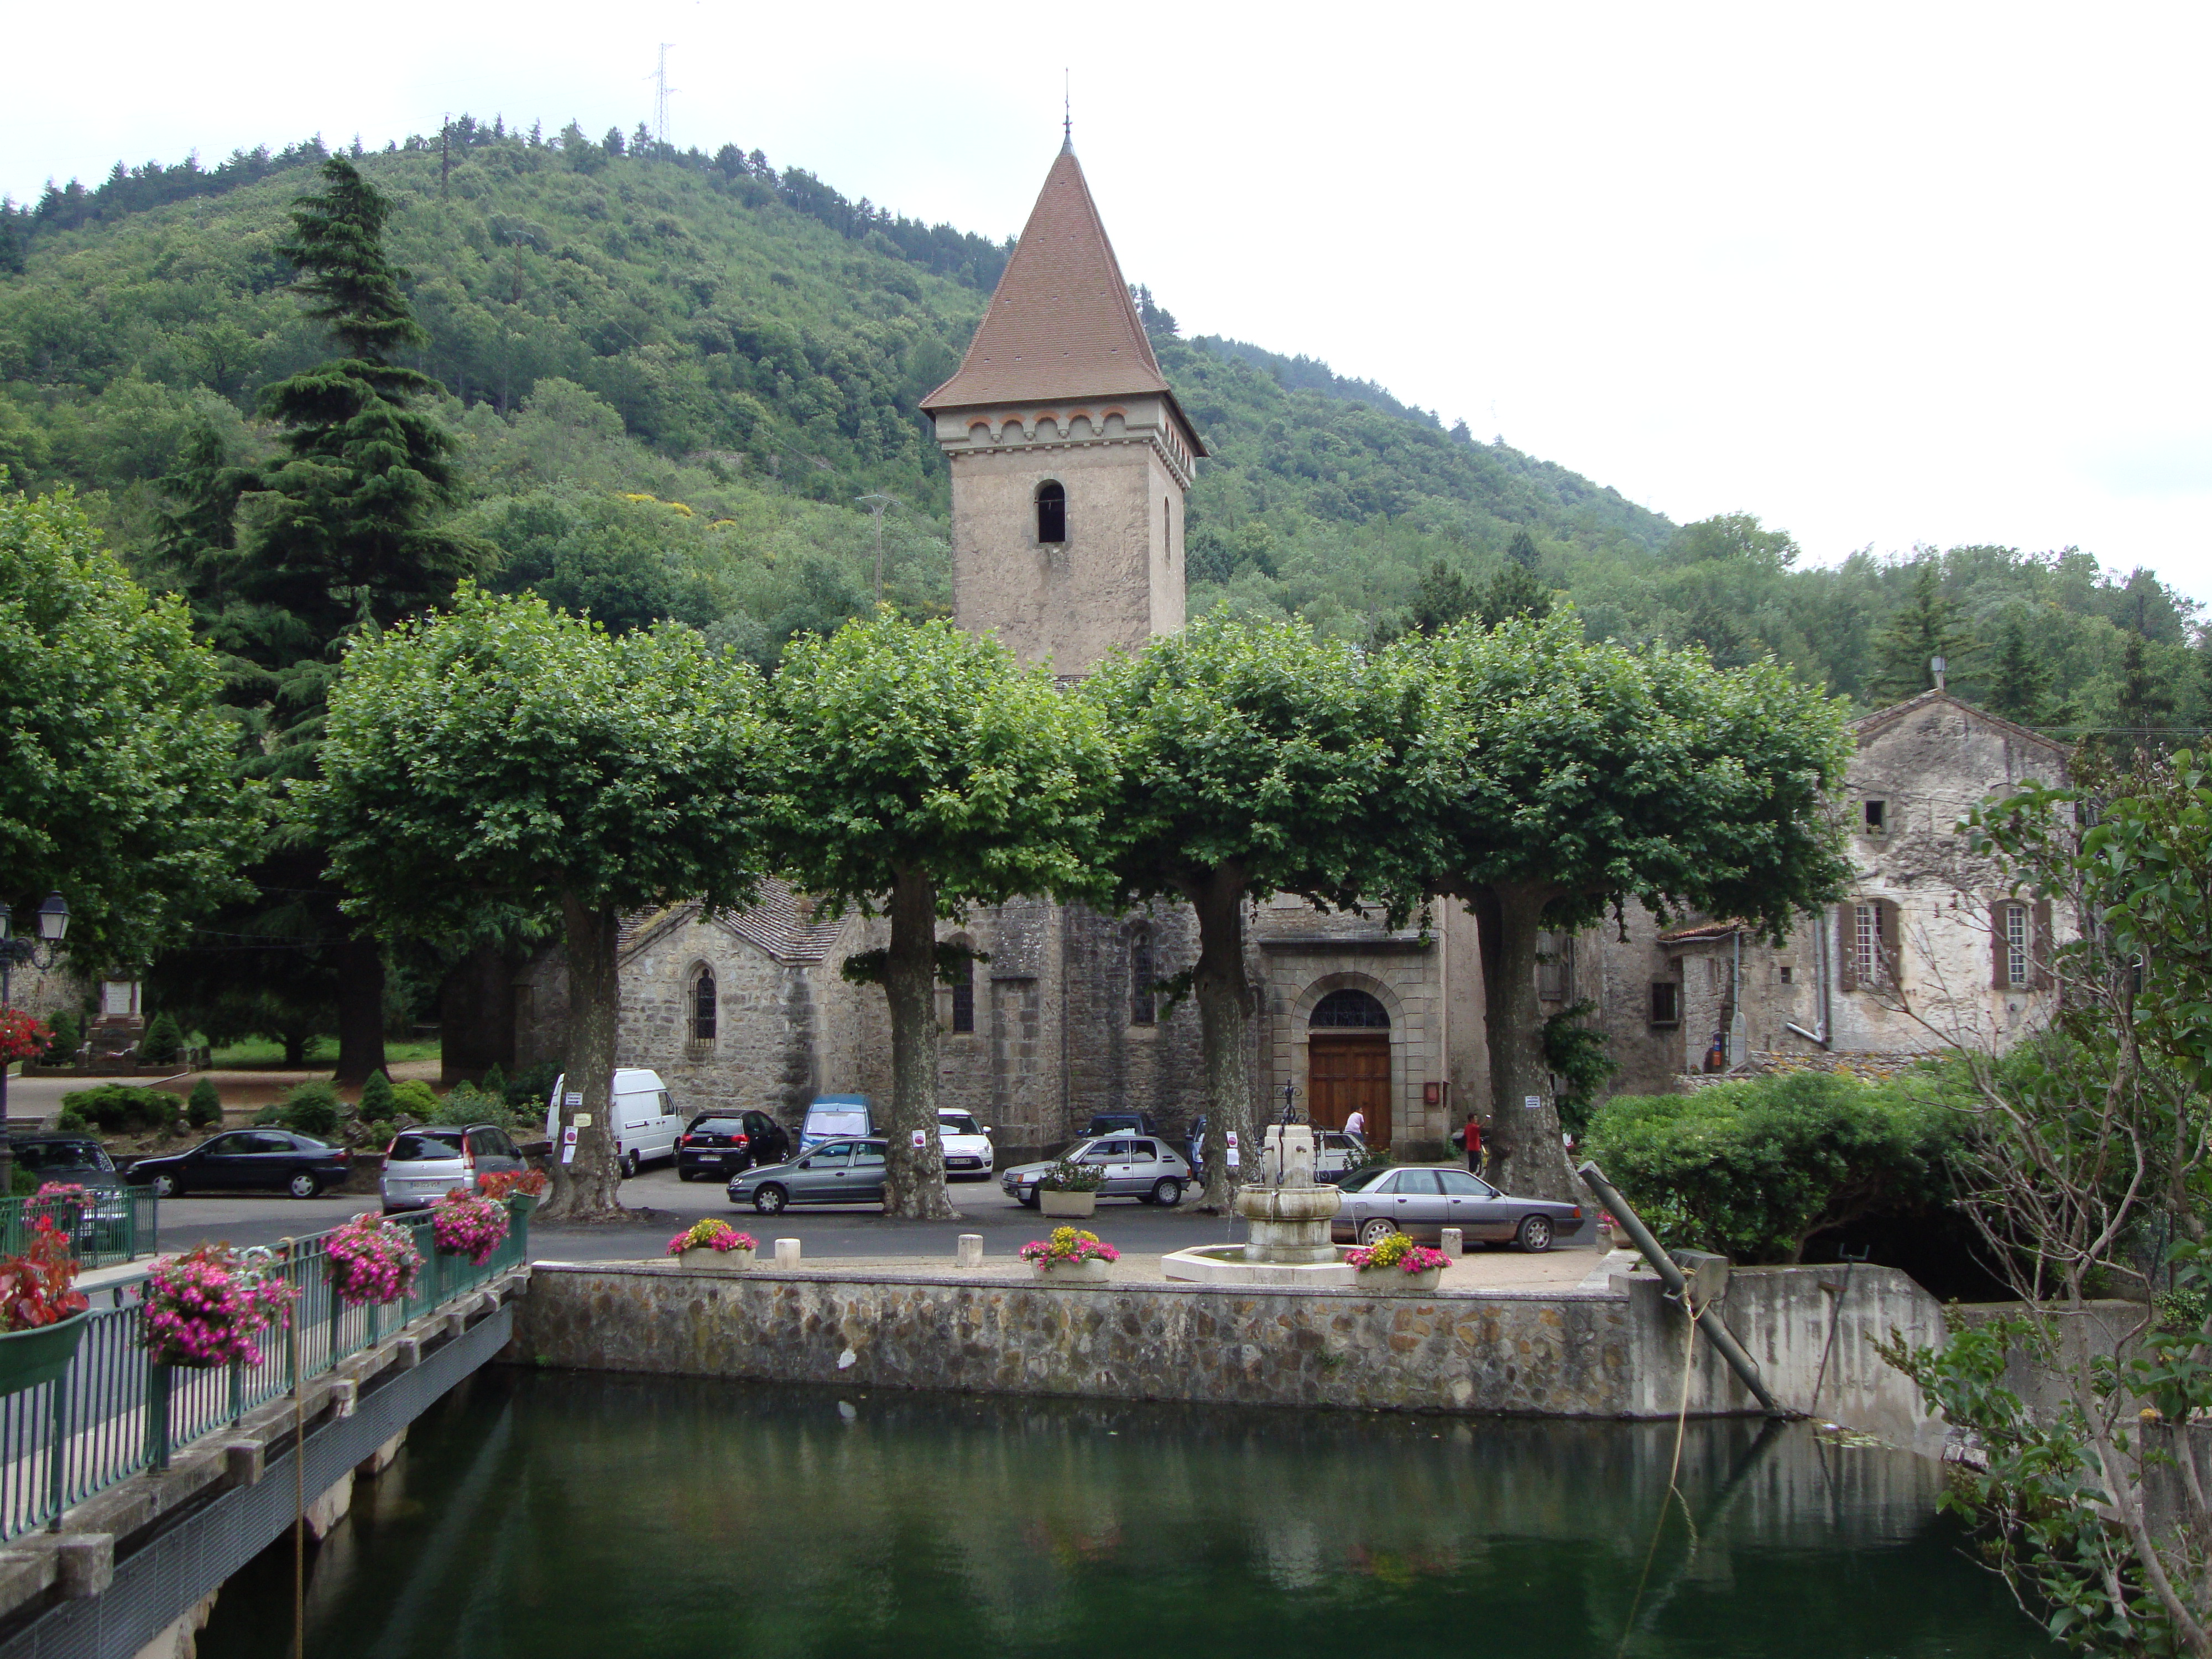 Lunas, Hérault